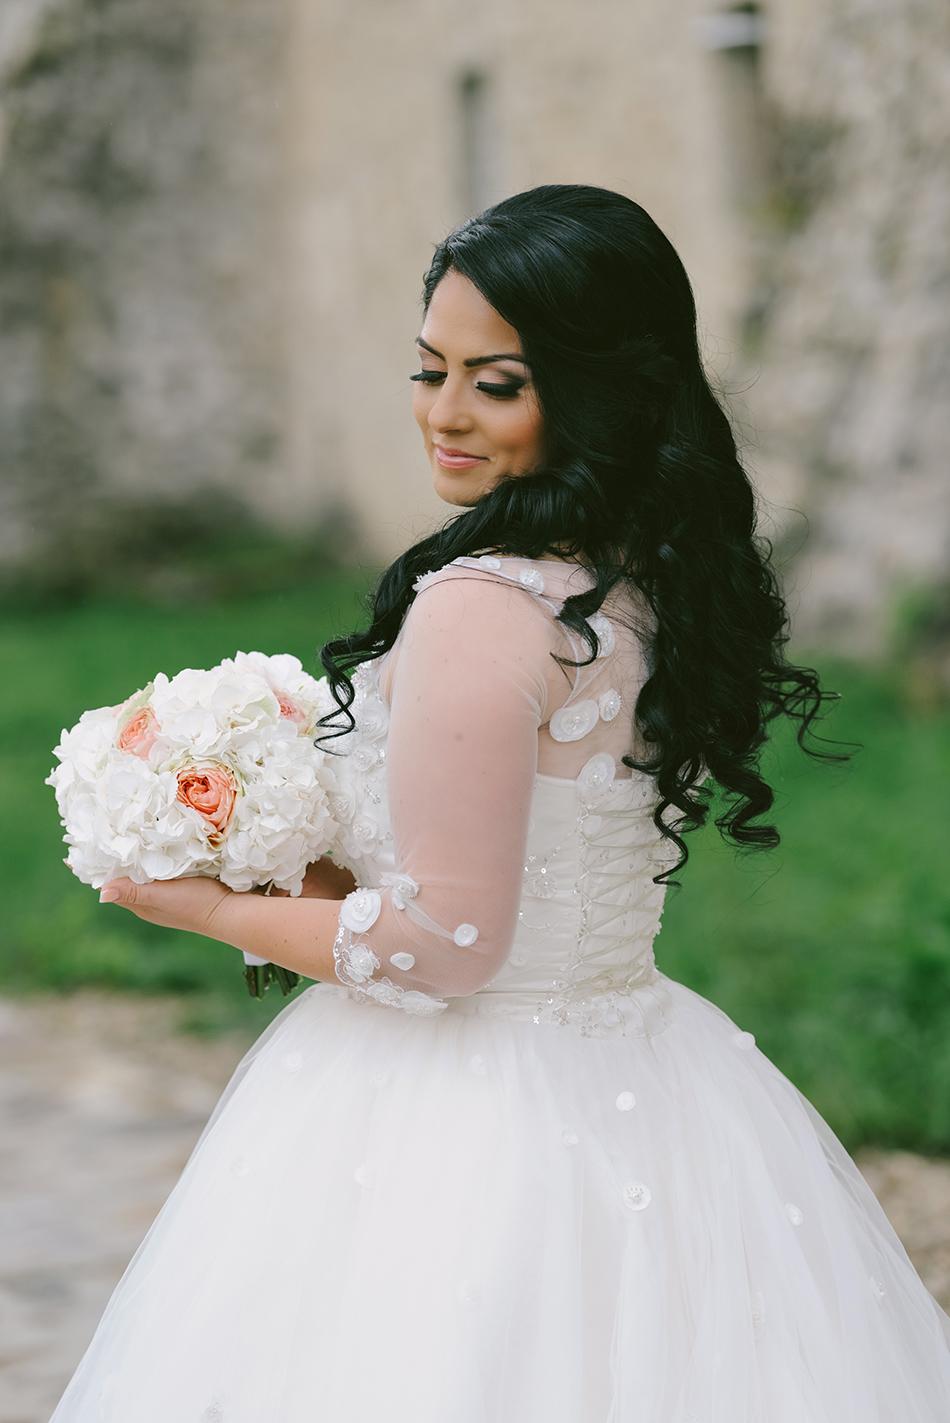 AD Passion Photography | ad-passion_diana-si-gabi_fotograf-nunta-suceava_0069 | Adelin, Dida, fotograf profesionist, fotograf de nunta, fotografie de nunta, fotograf Timisoara, fotograf Craiova, fotograf Bucuresti, fotograf Arad, nunta Timisoara, nunta Arad, nunta Bucuresti, nunta Craiova